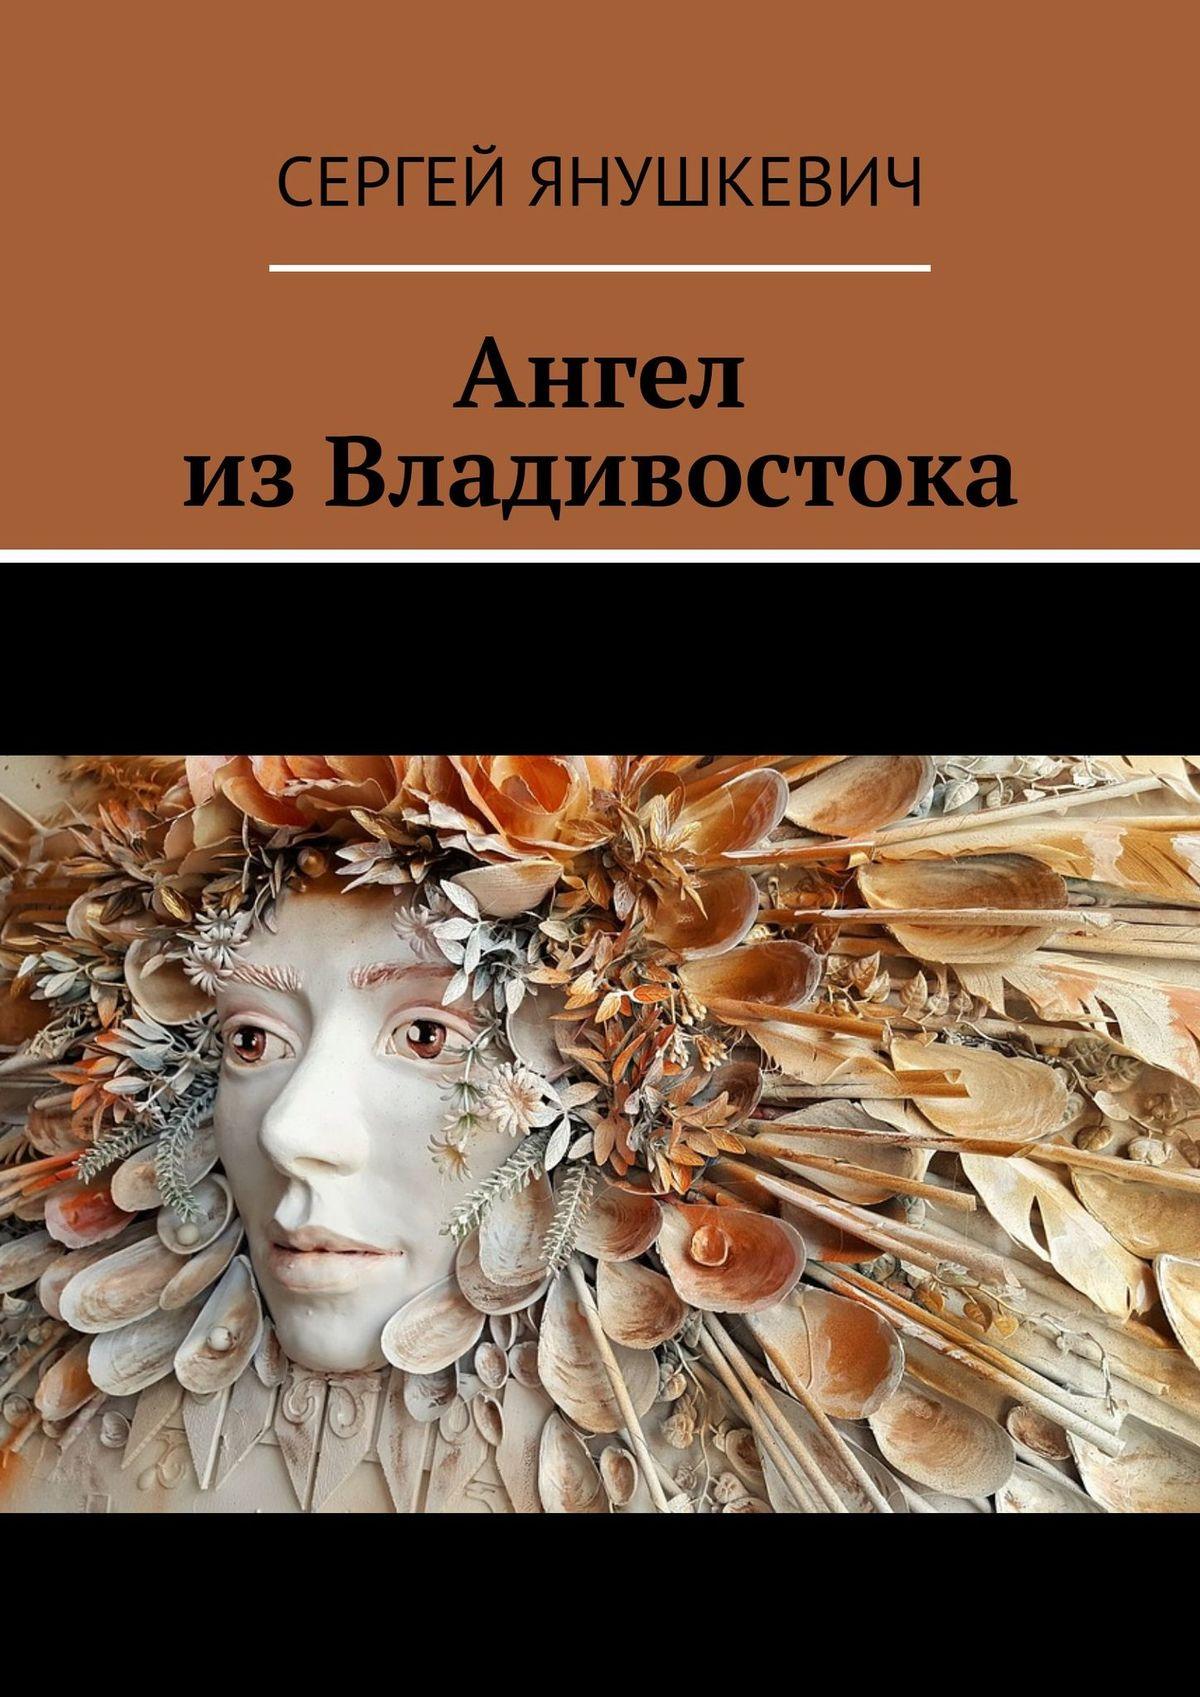 Ангел изВладивостока